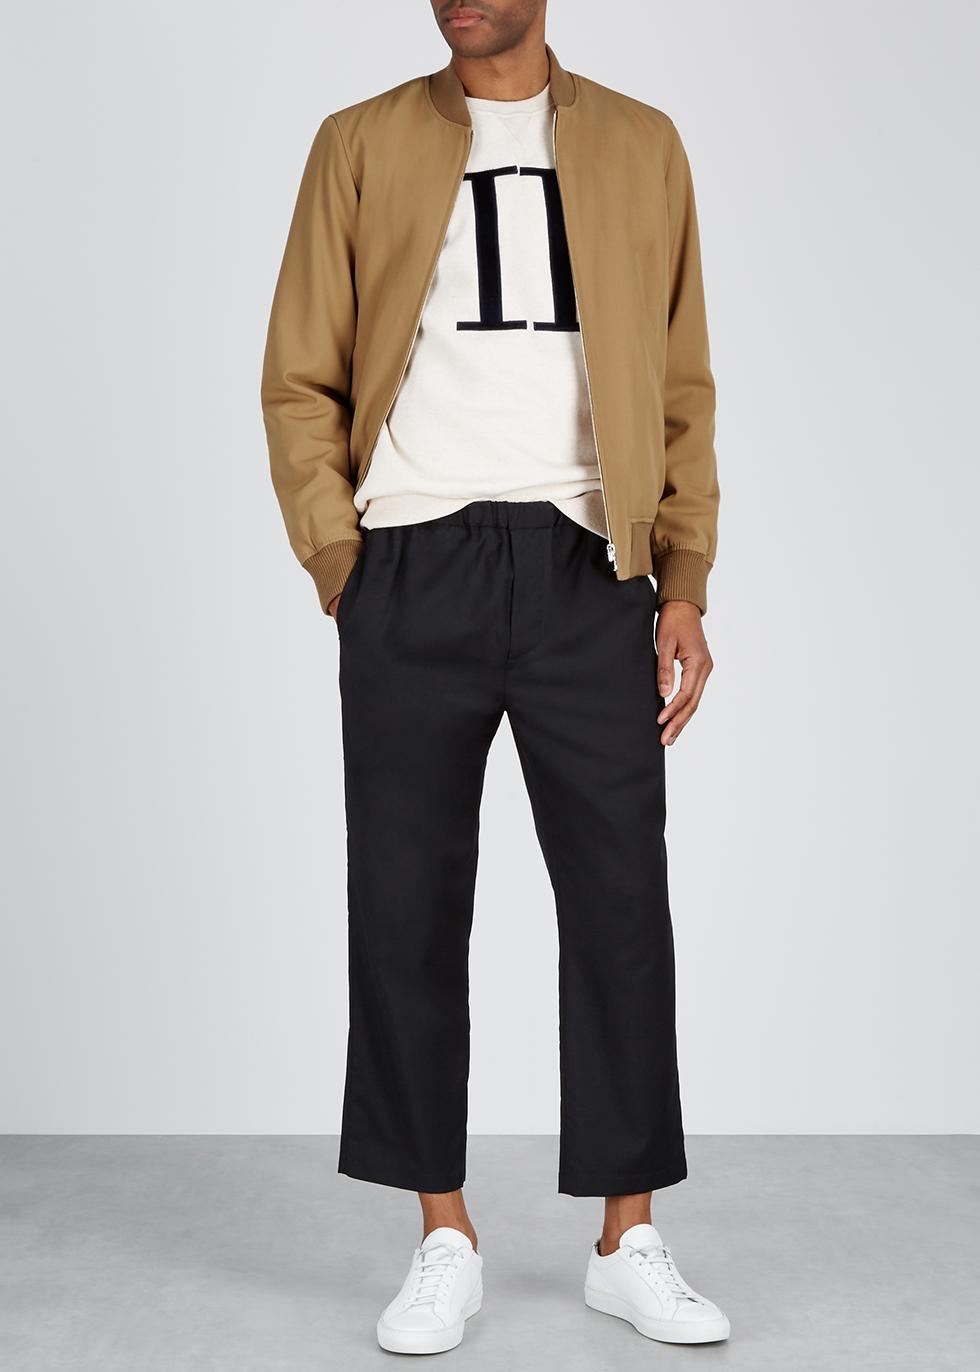 MA1 camel wool-blend bomber jacket - A.P.C.